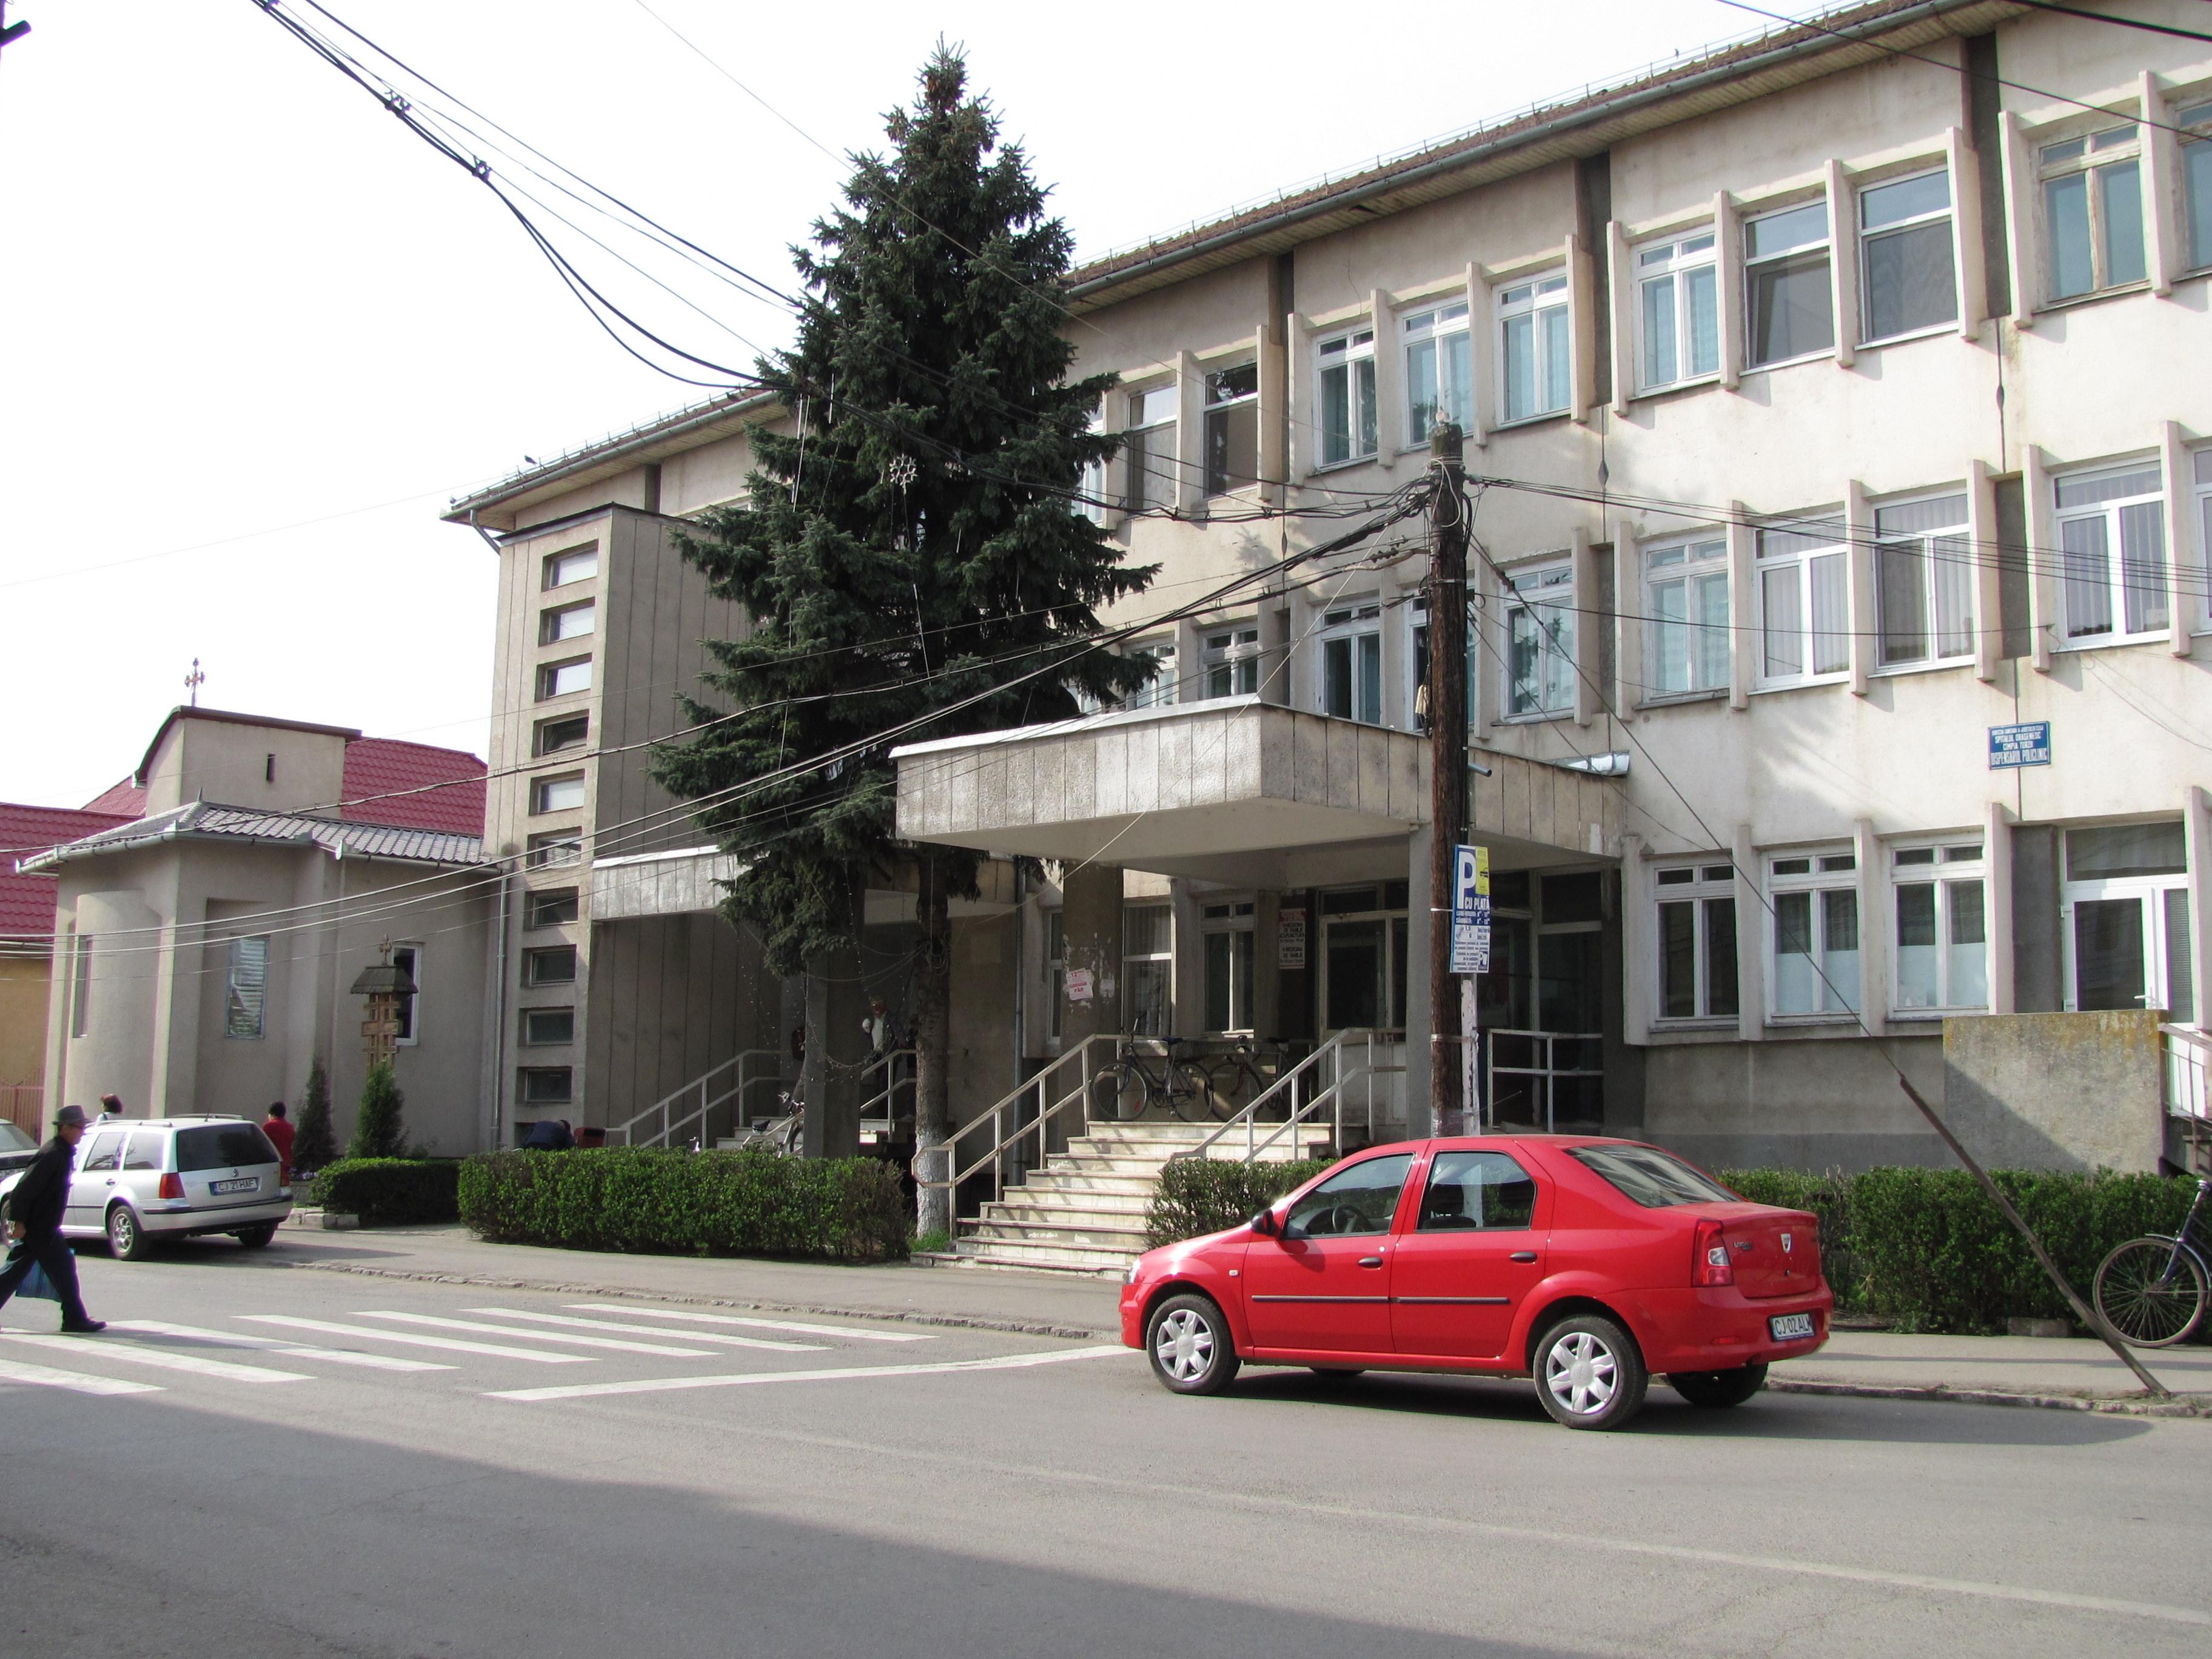 Ana-Maria Avram / Iancu Dumitrescu - Laboratory